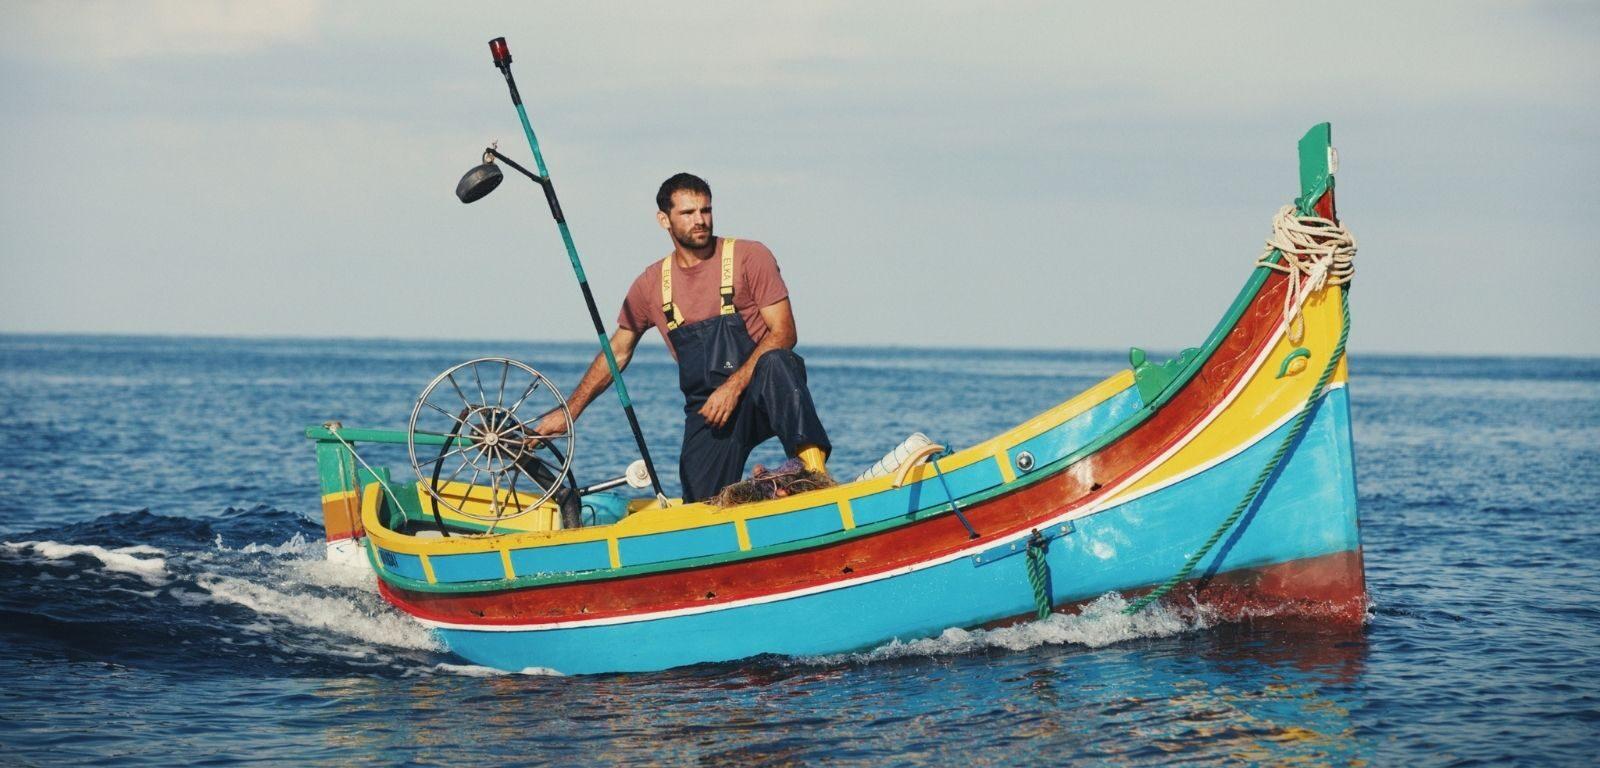 Fisherman Jesmark Scicluna in Luzzu 2021 - an Alex Camillieri film